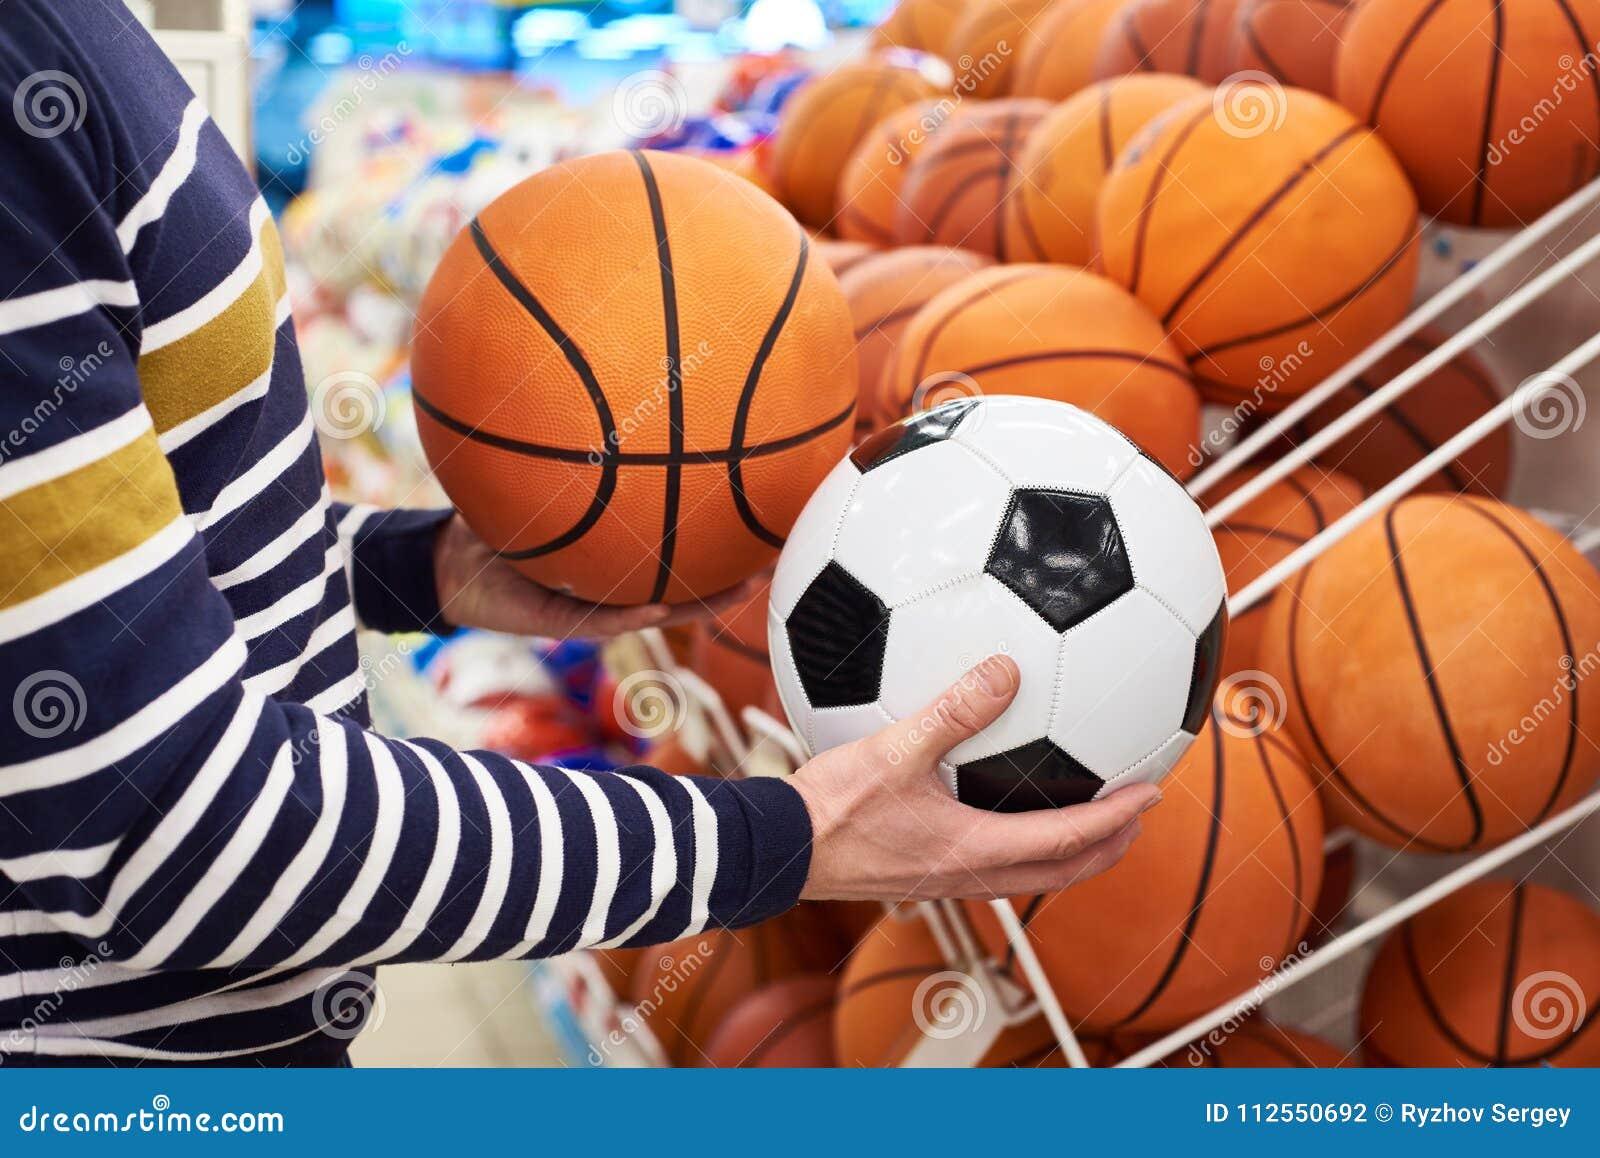 Basketball Sports Store Near Me a1e1dd9095c4